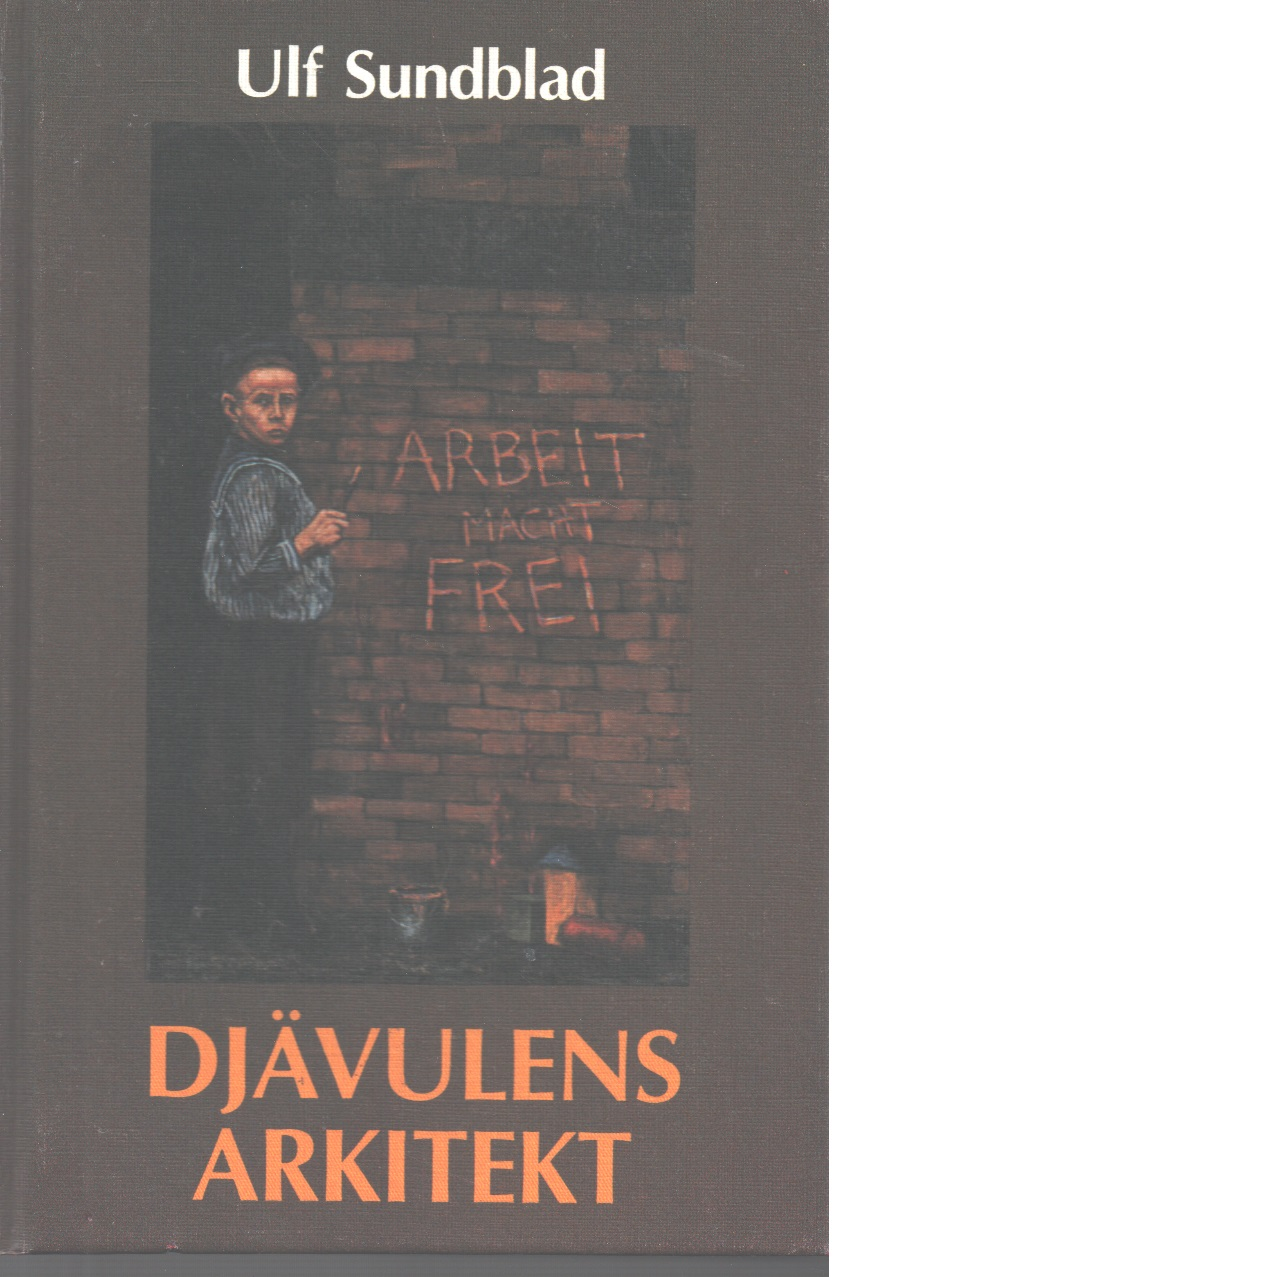 Djävulens arkitekt - Sundblad, Ulf